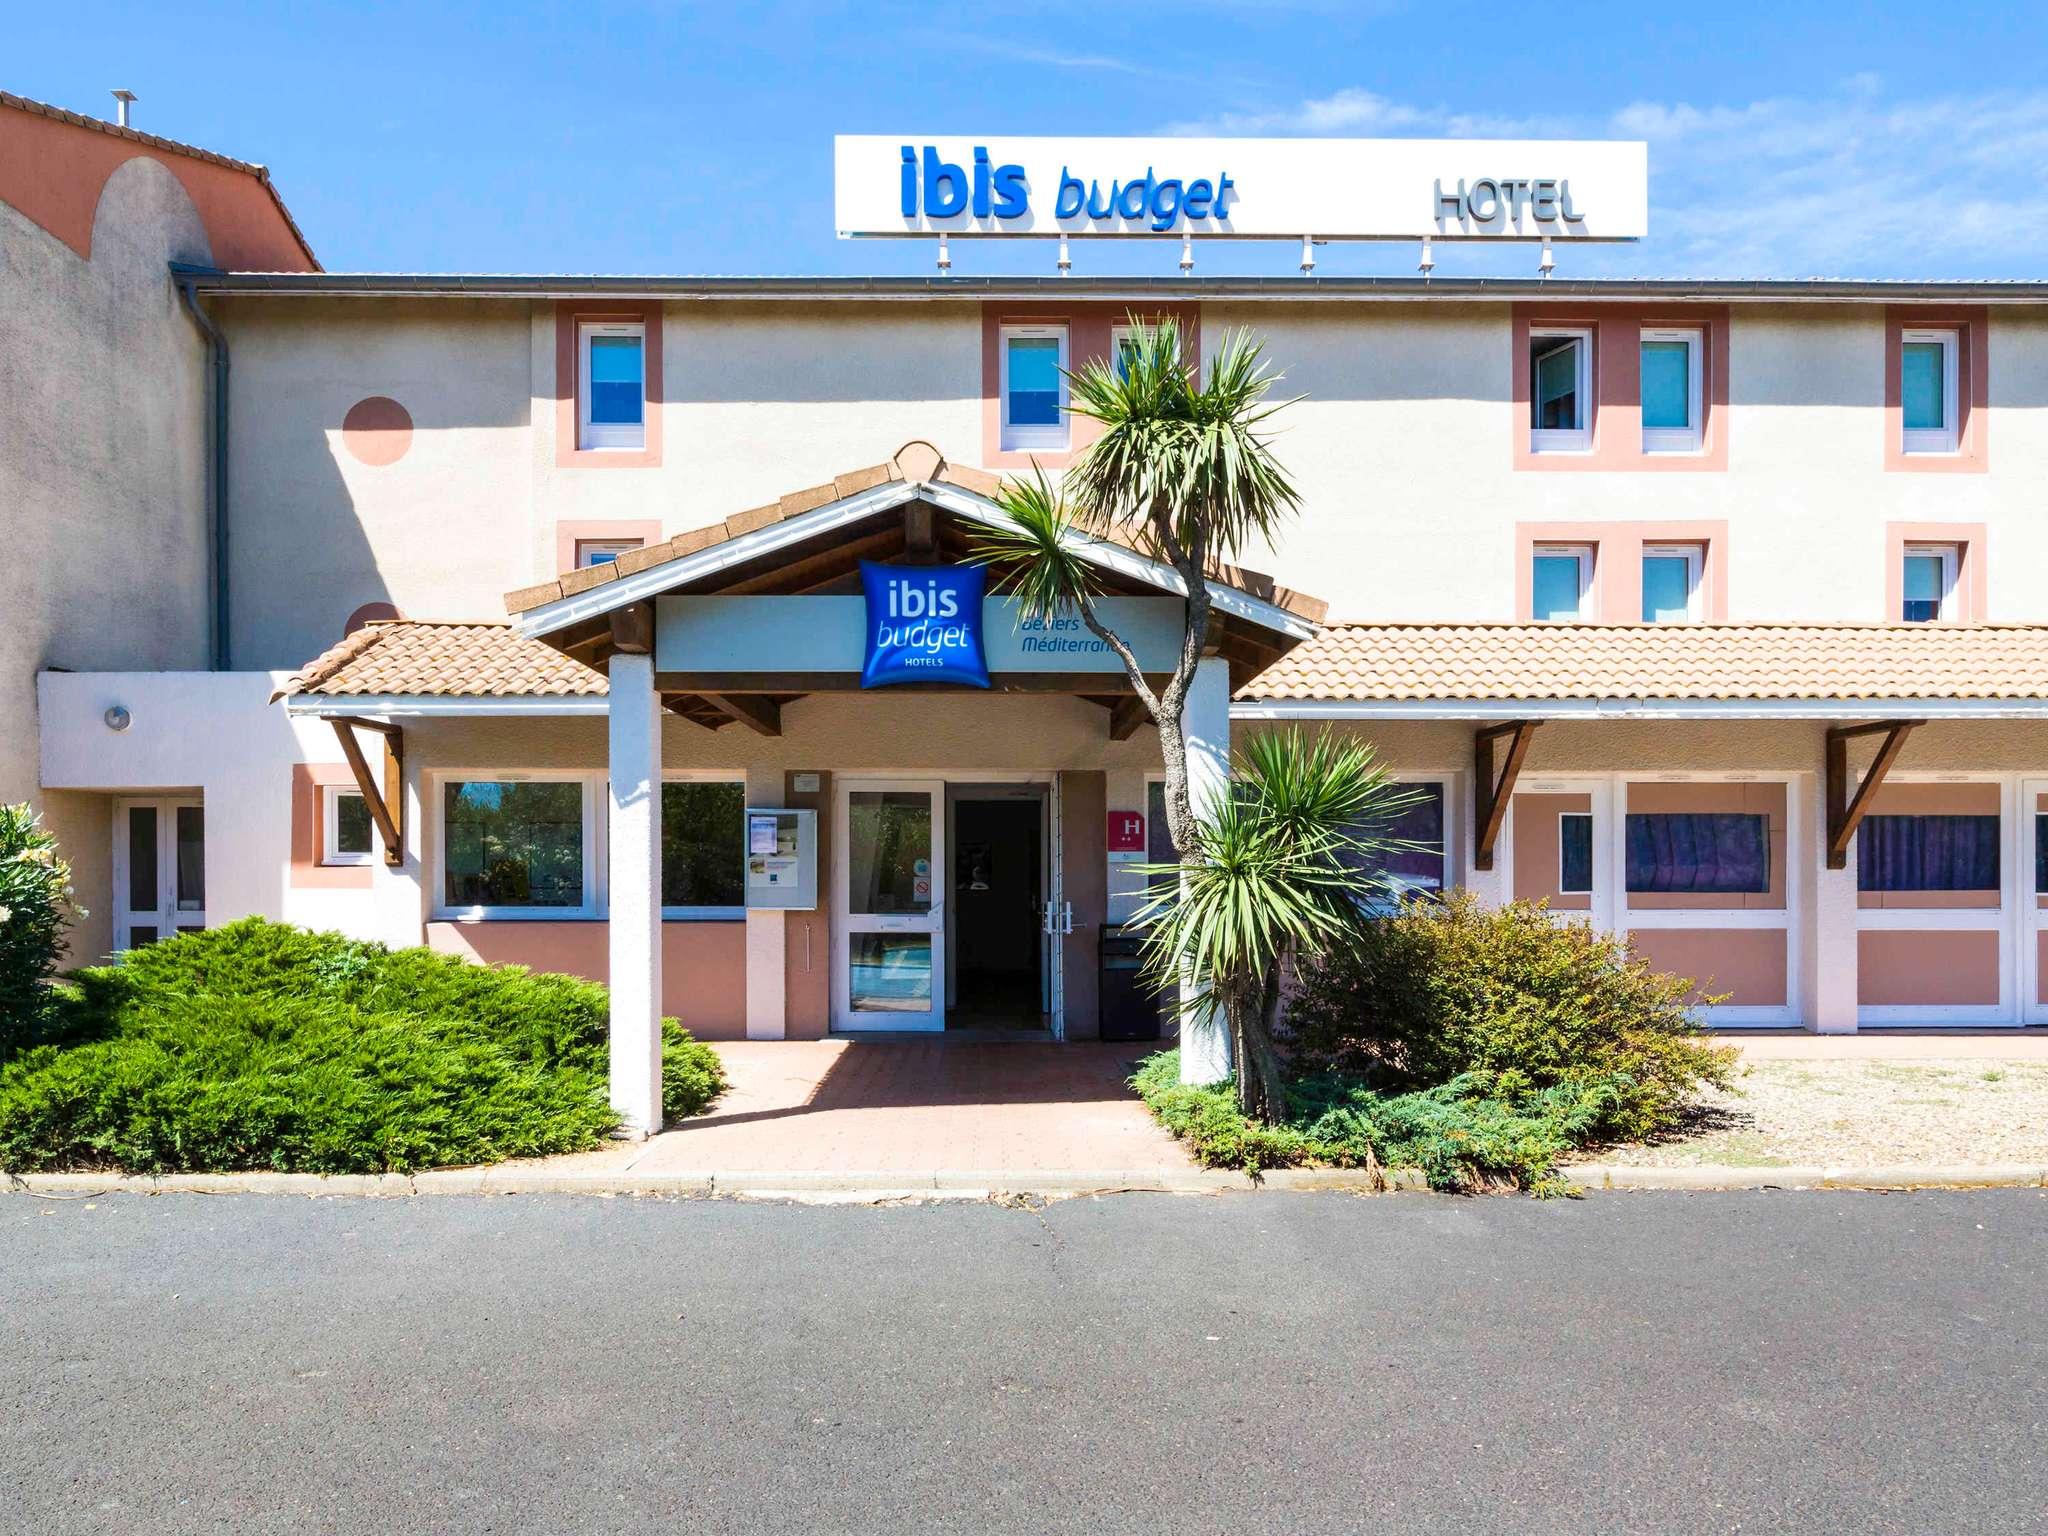 Hotel – ibis budget Béziers Est Mediterranée